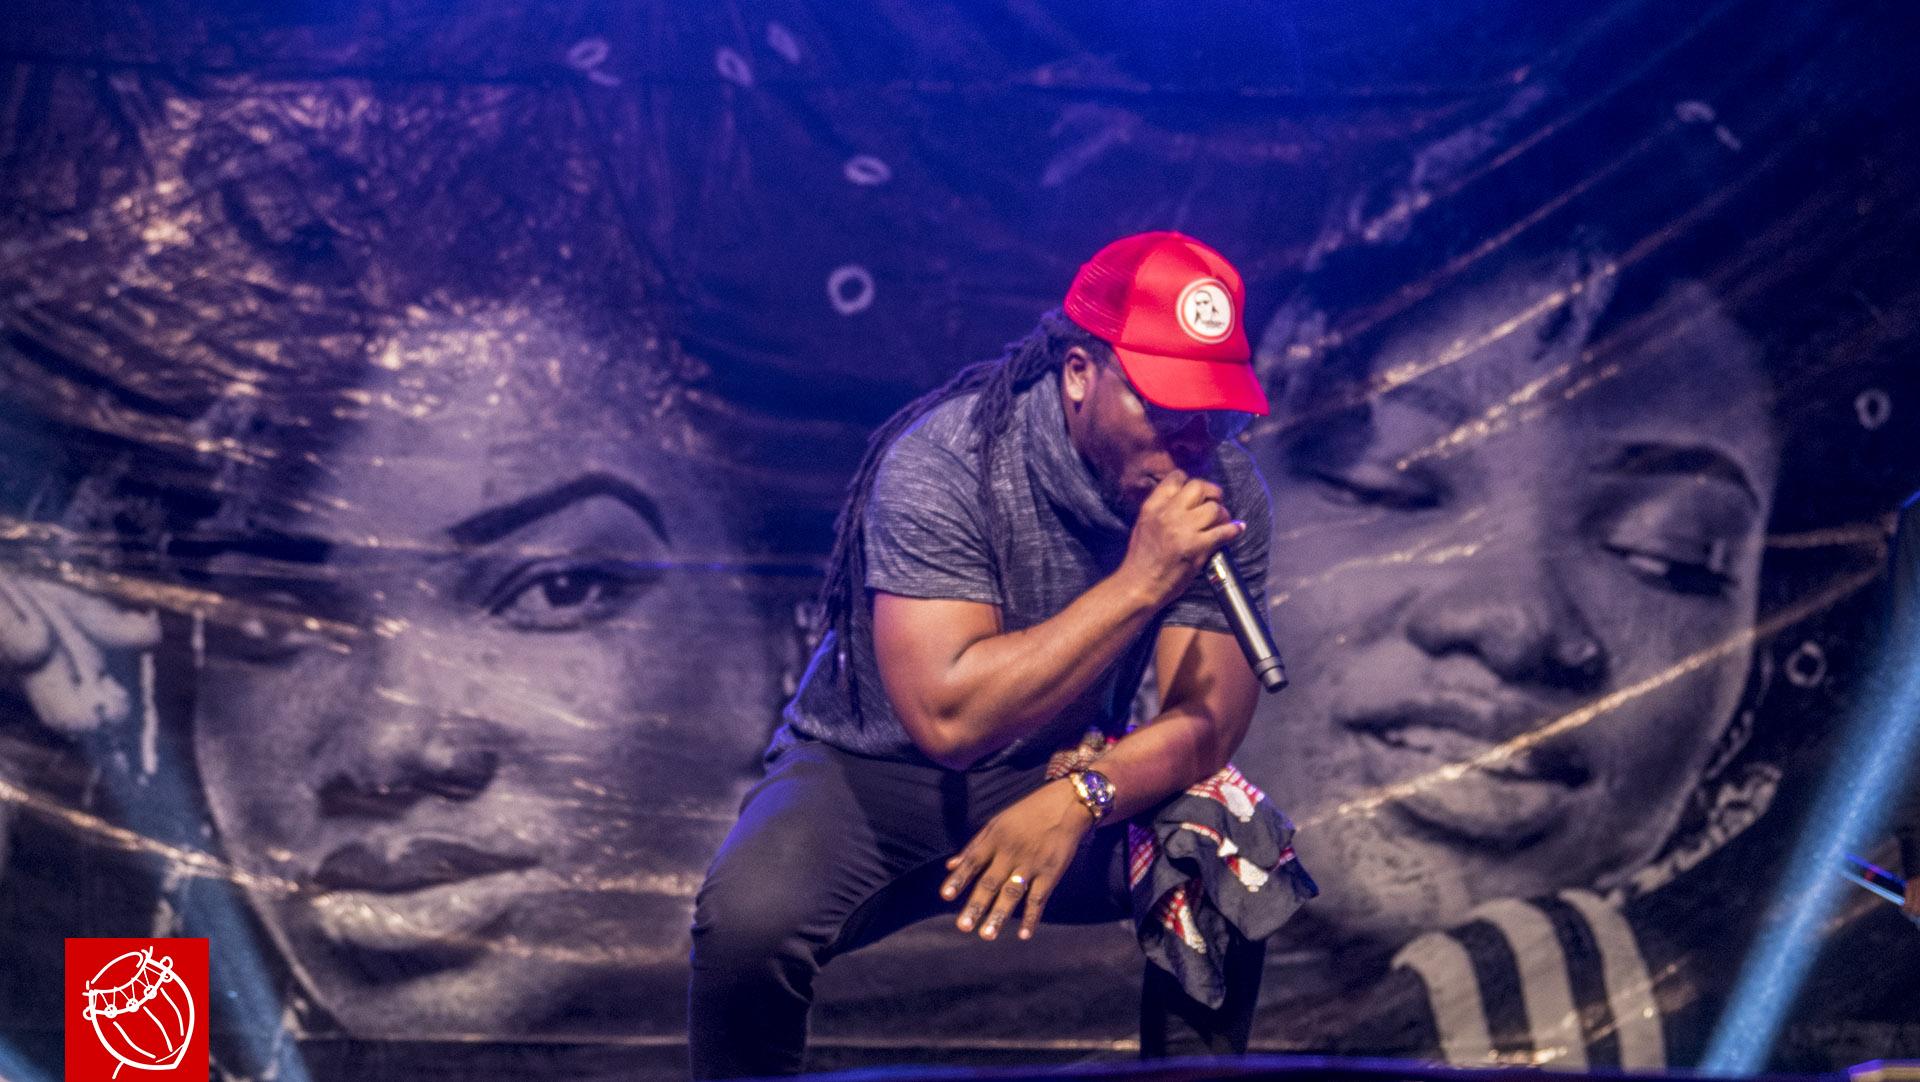 Tribute to Ebony Reigns